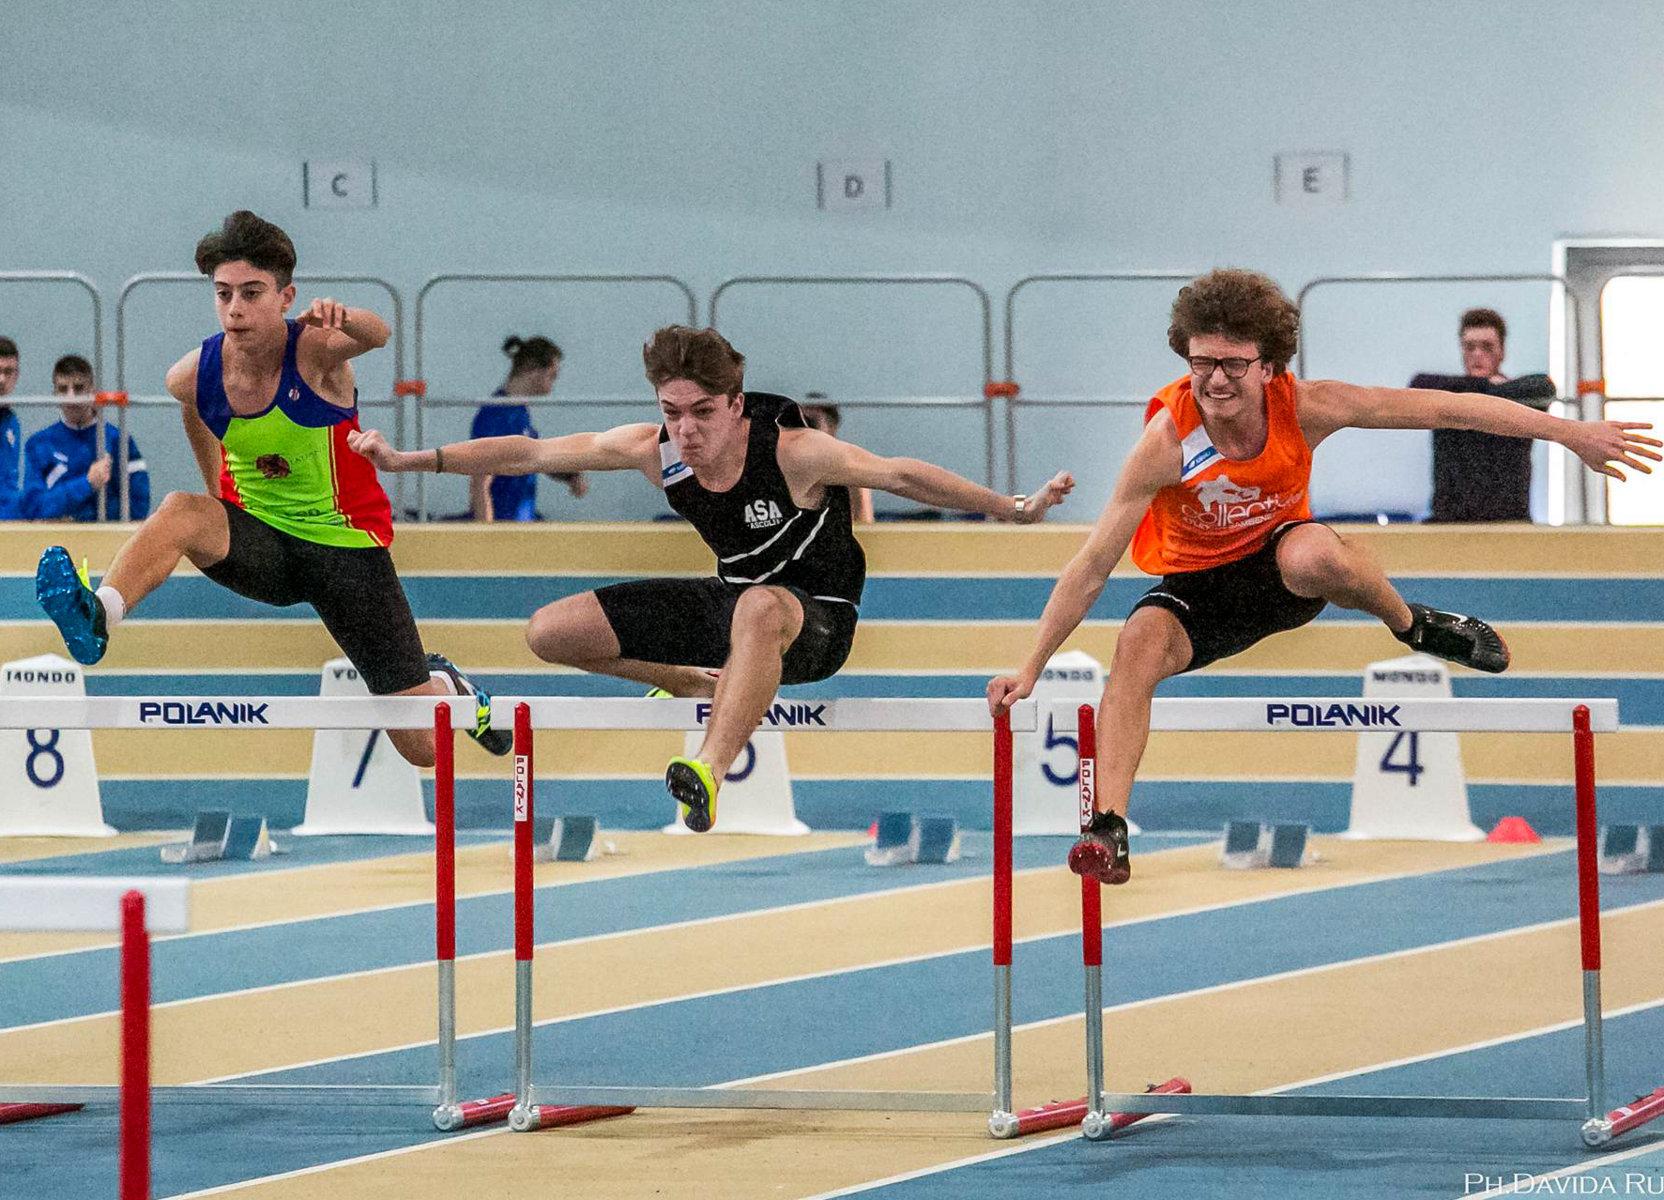 Week end di soddisfazioni per gli atleti dell'ASA al Palaindoor